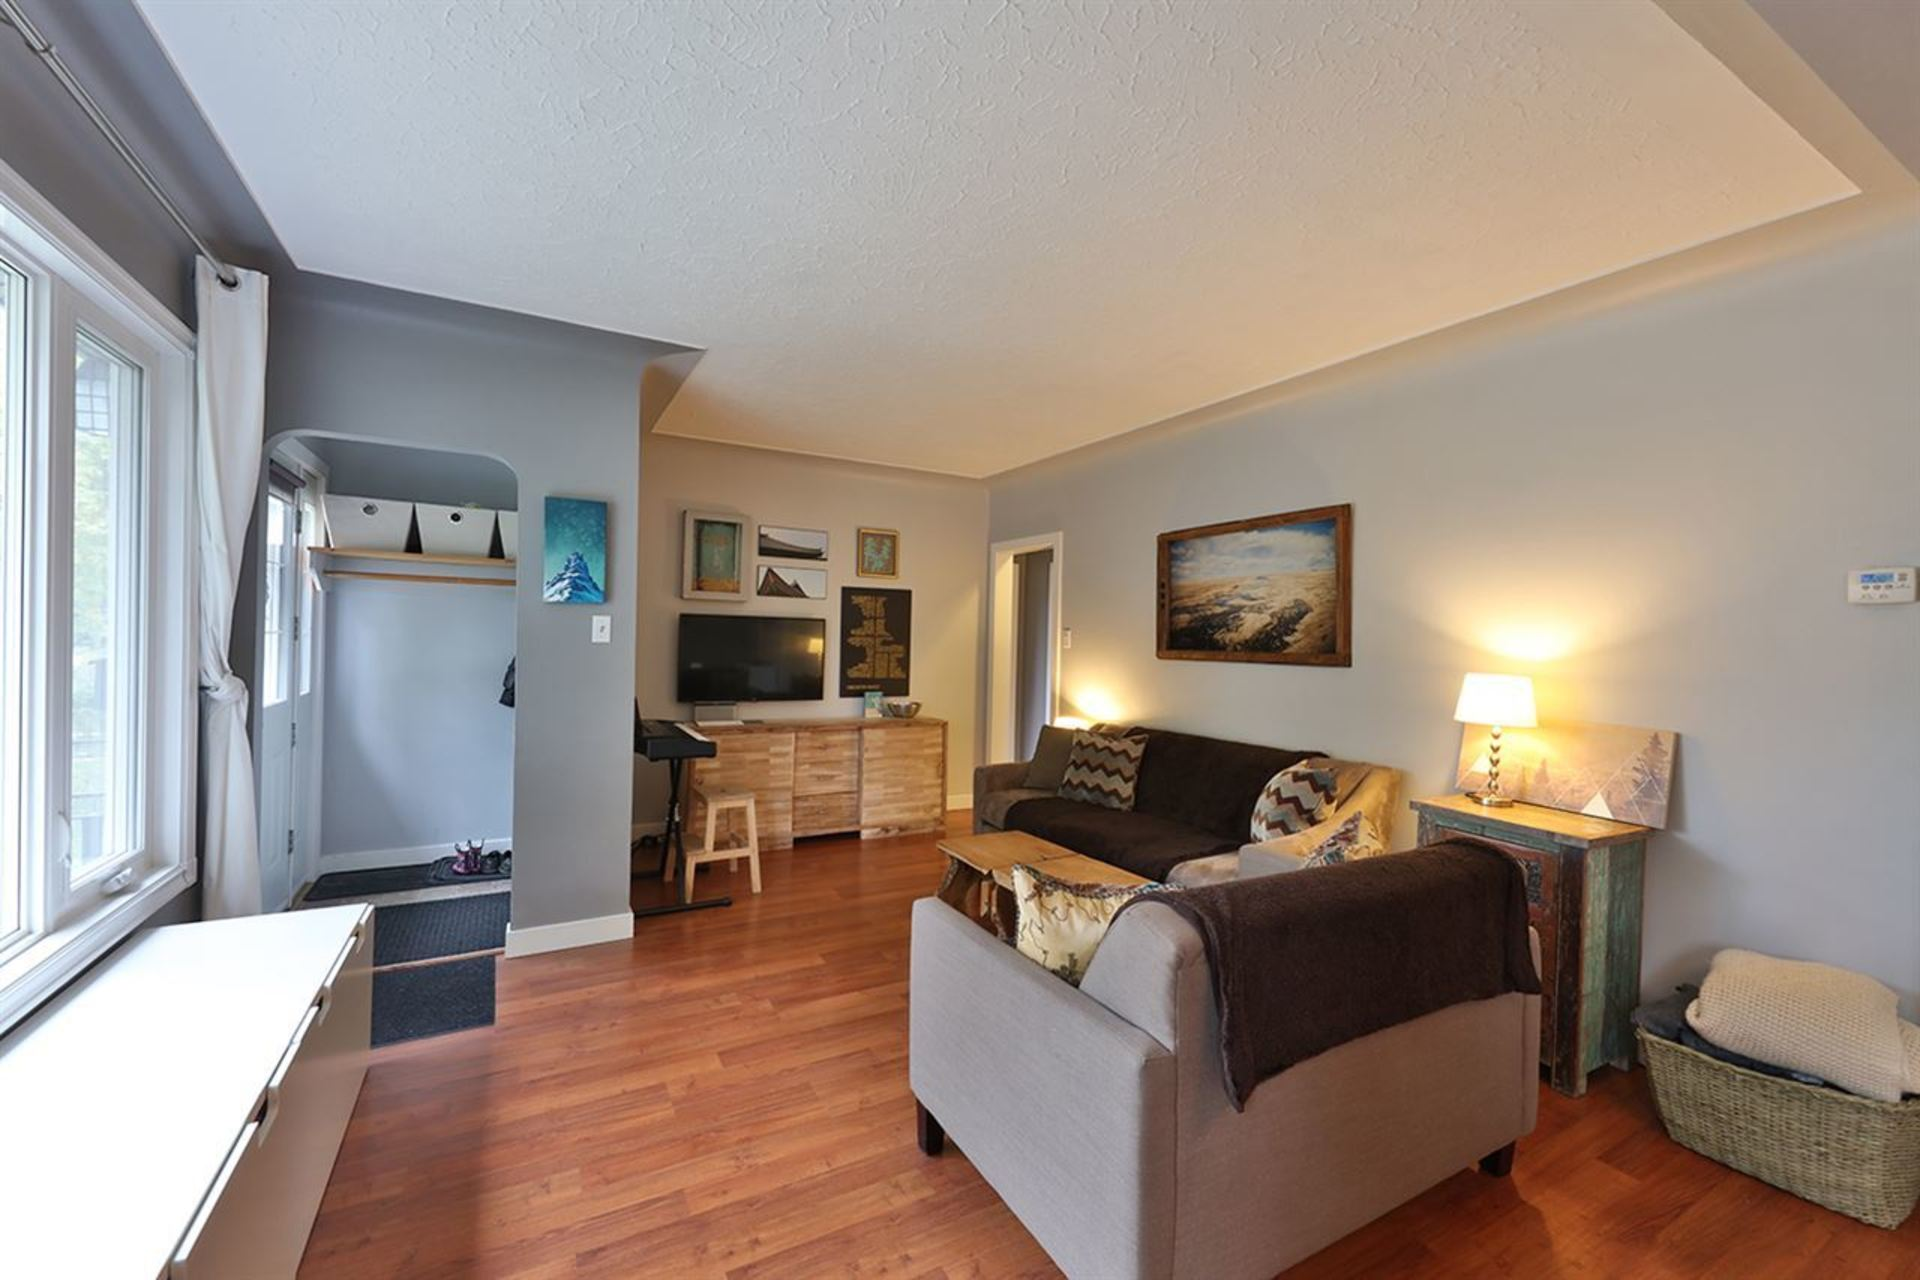 8819-87-street-bonnie-doon-edmonton-03 at 8819 87 Street, Bonnie Doon, Edmonton